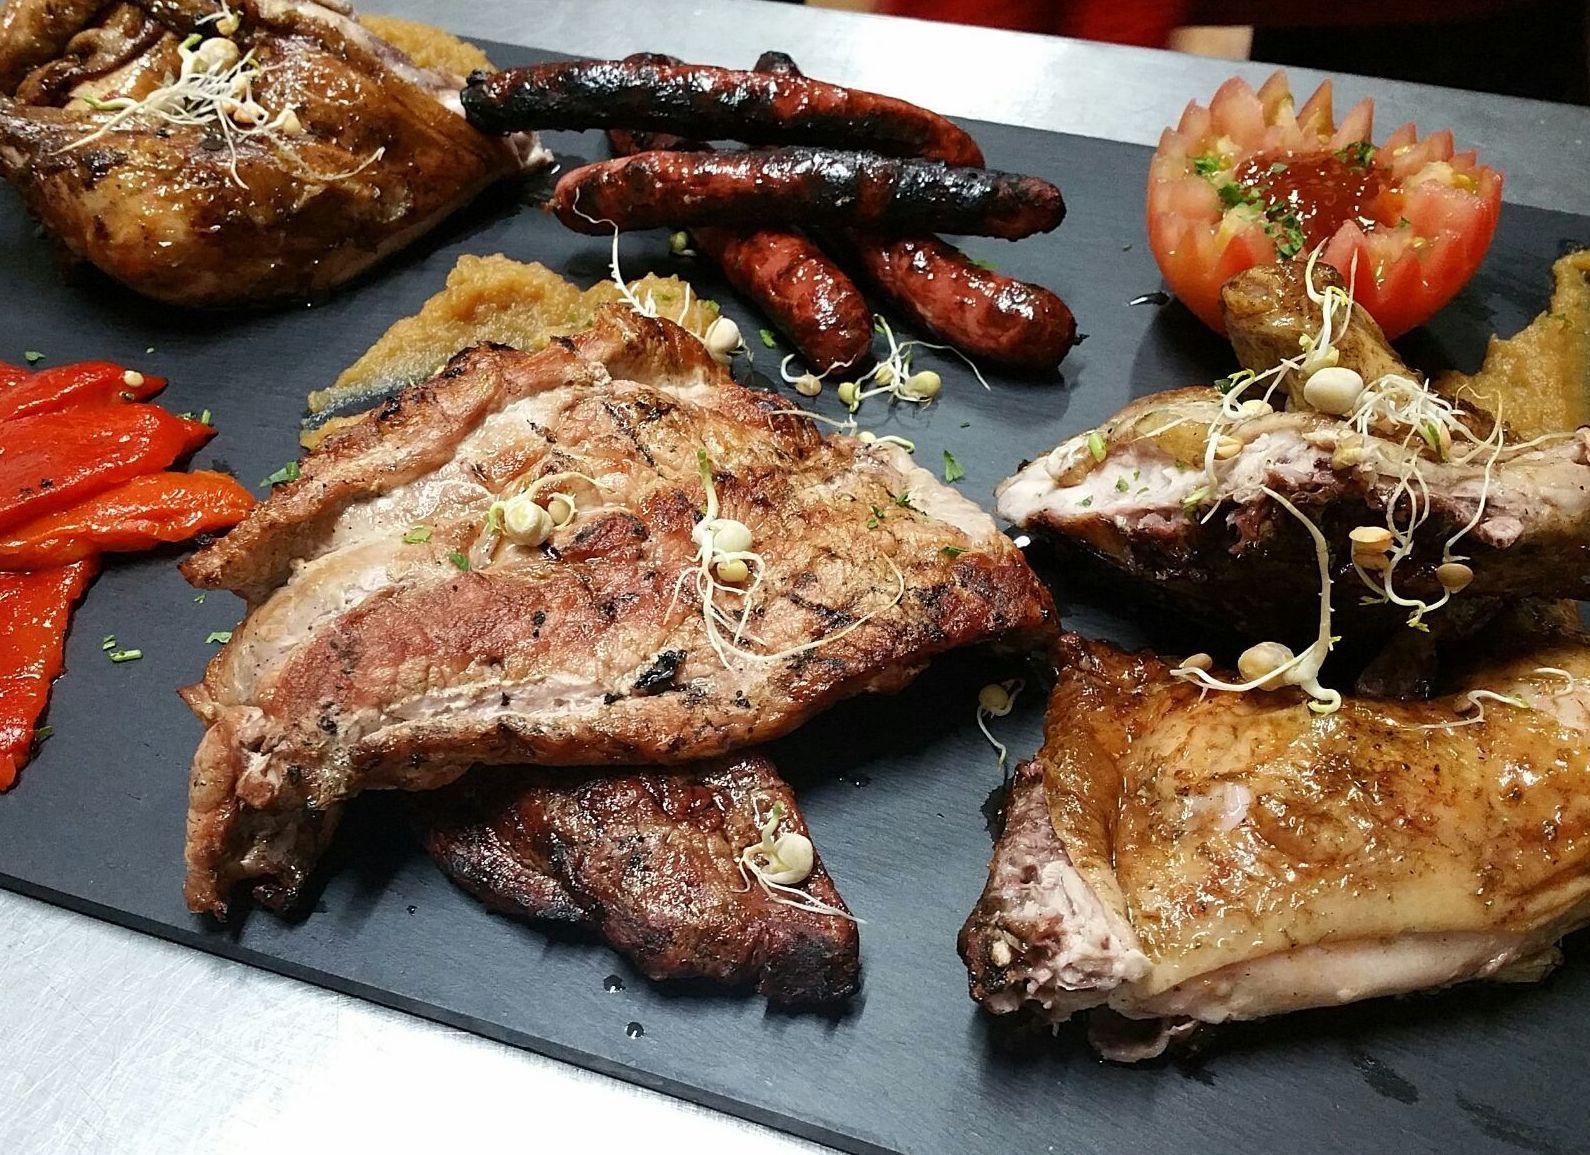 Foto 21 de Restaurante en Santa Cruz de Tenerife | Restaurante La Ksona